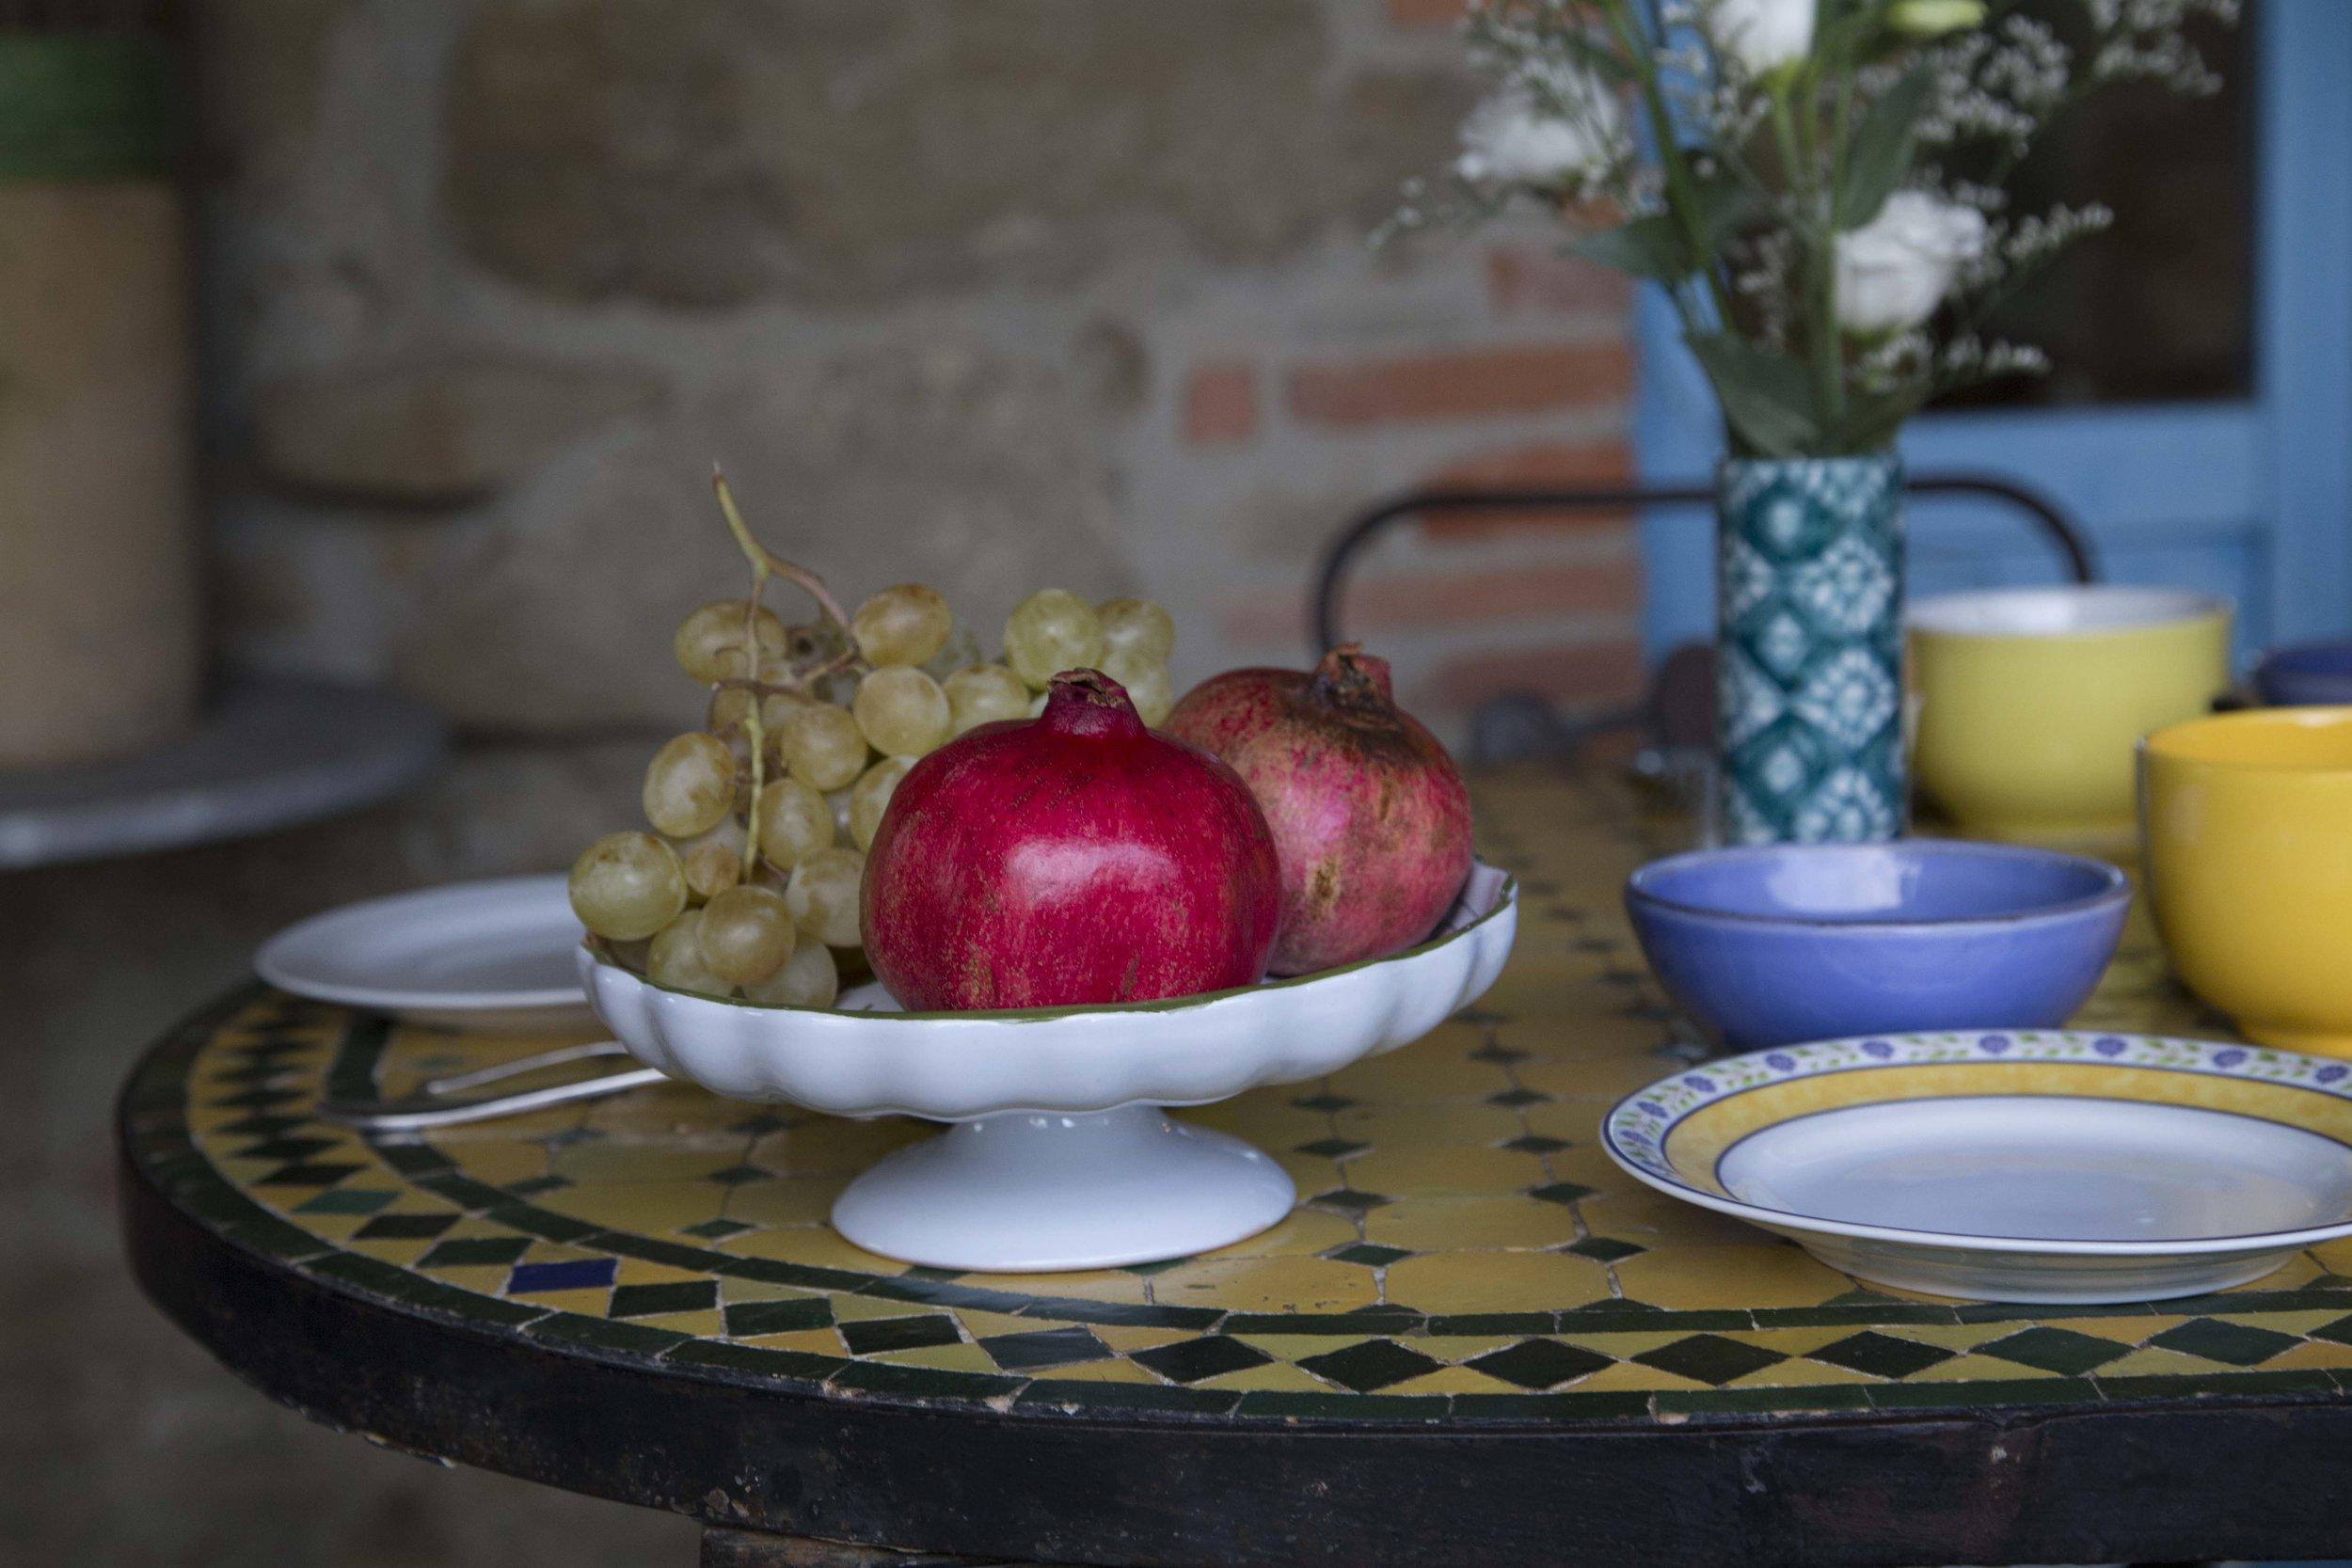 Maraviglia Table.jpg